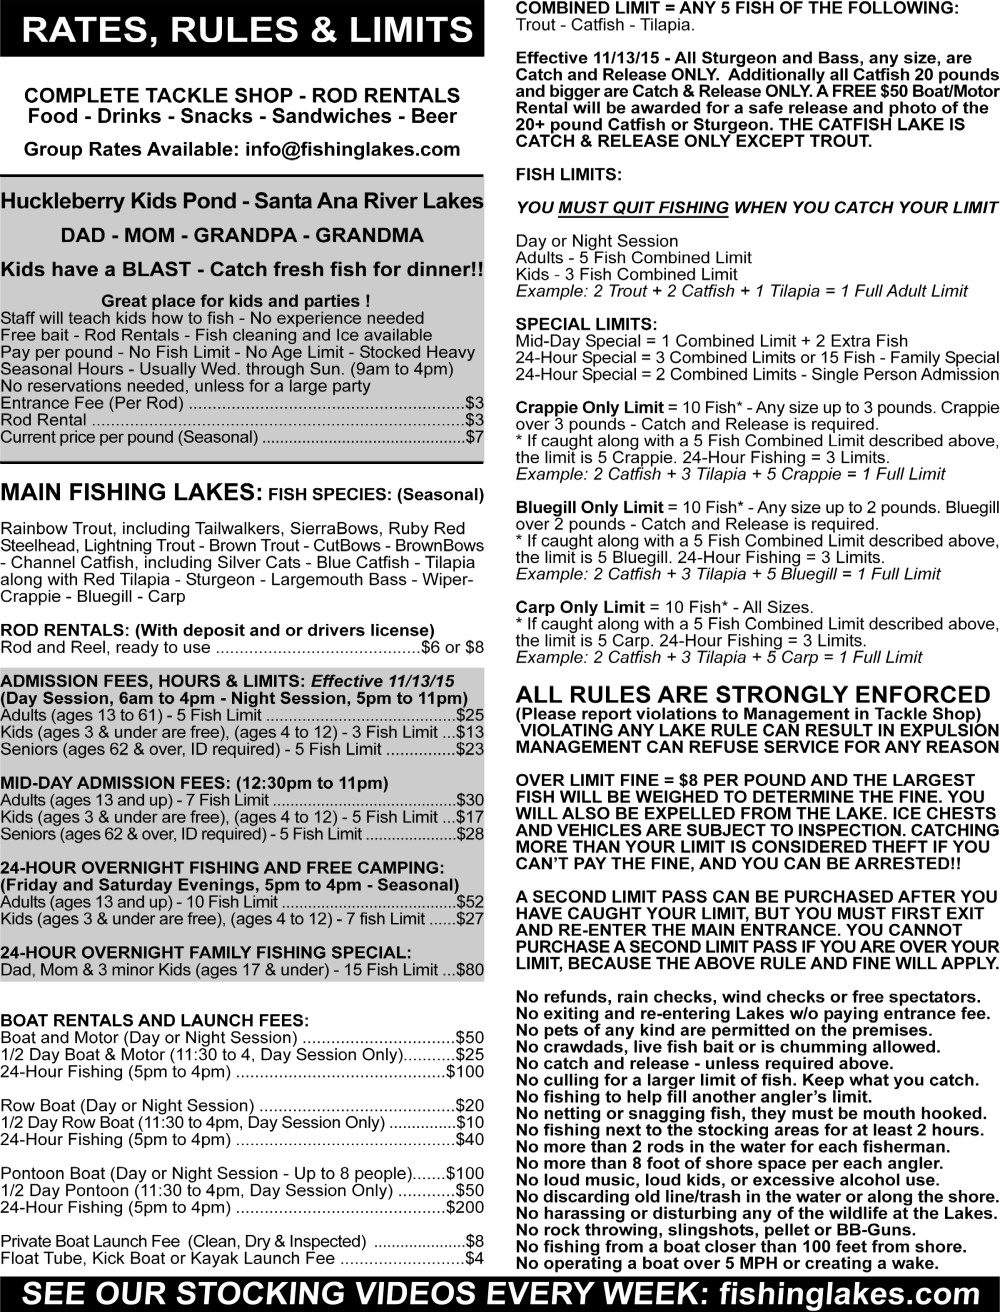 NEW - Lake Brochure New